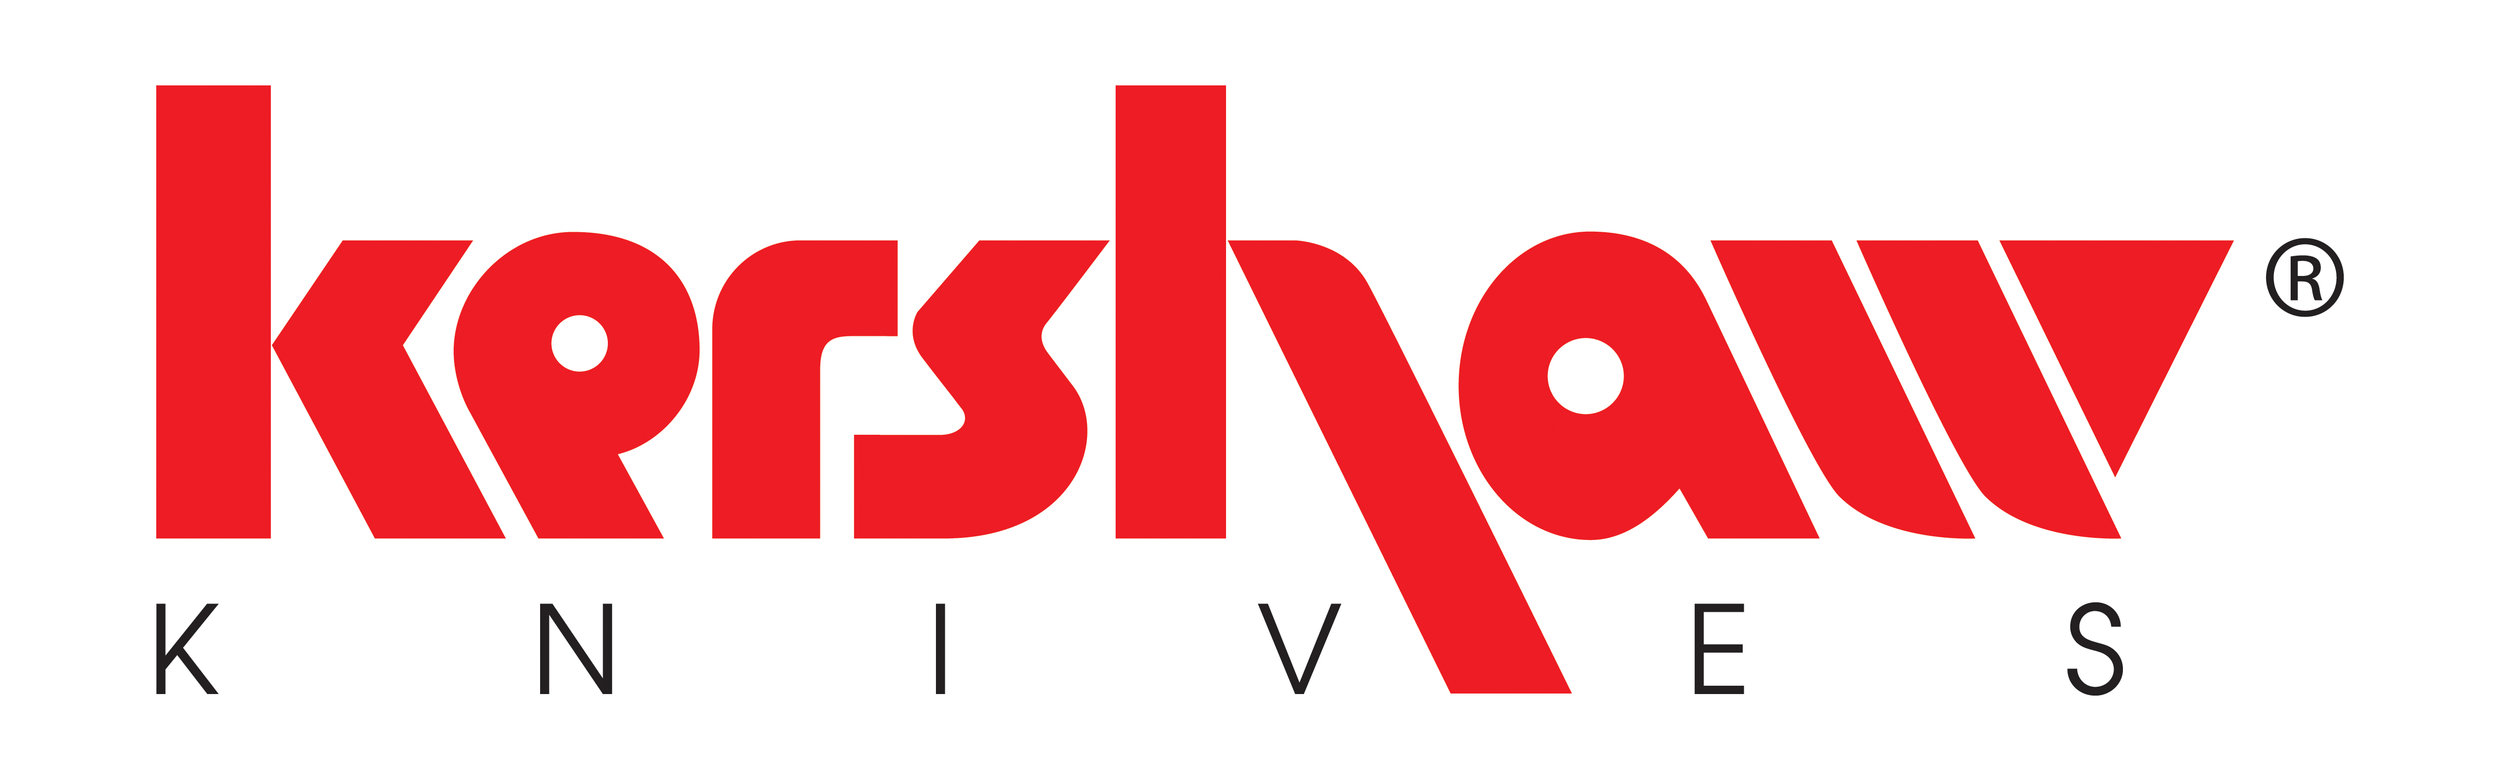 kershaw-knives-logo.jpg